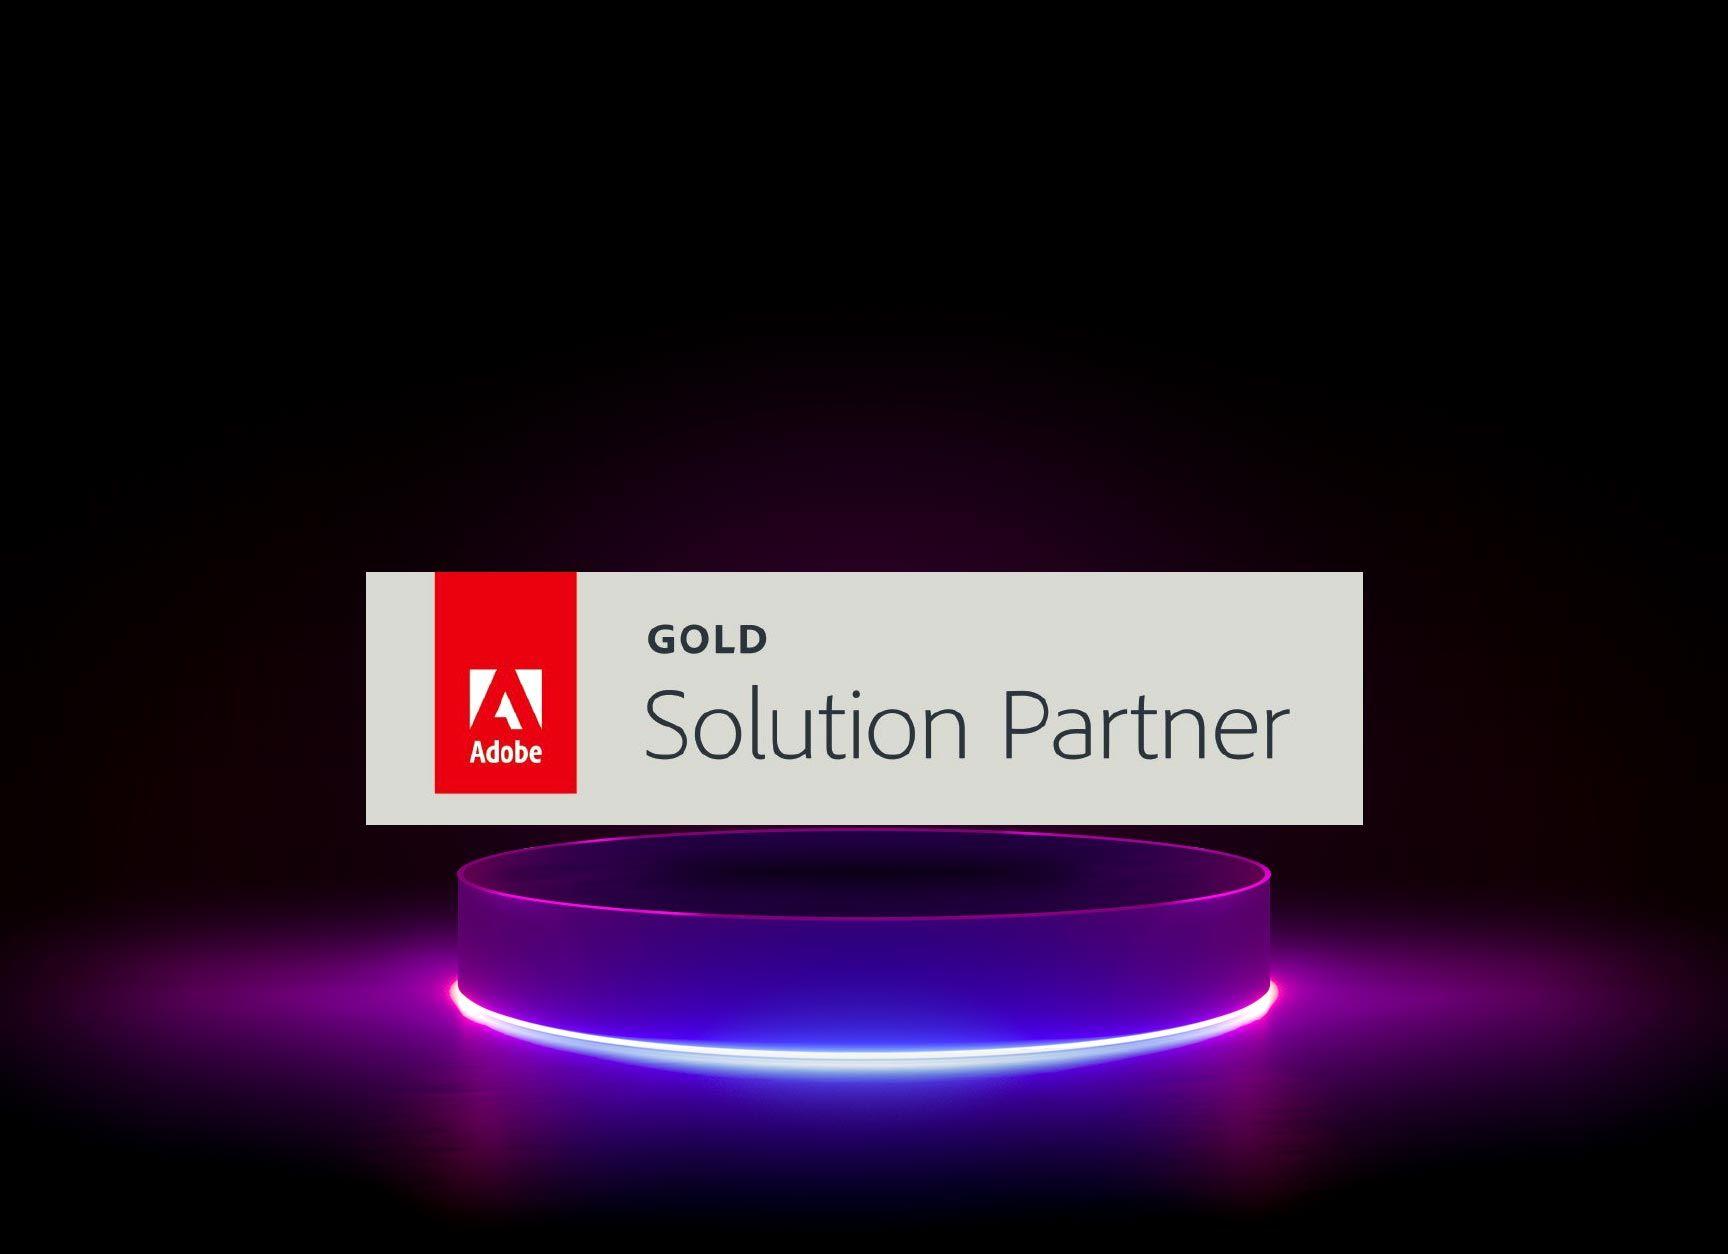 diva-e erreicht Adobe Gold-Partner-Status